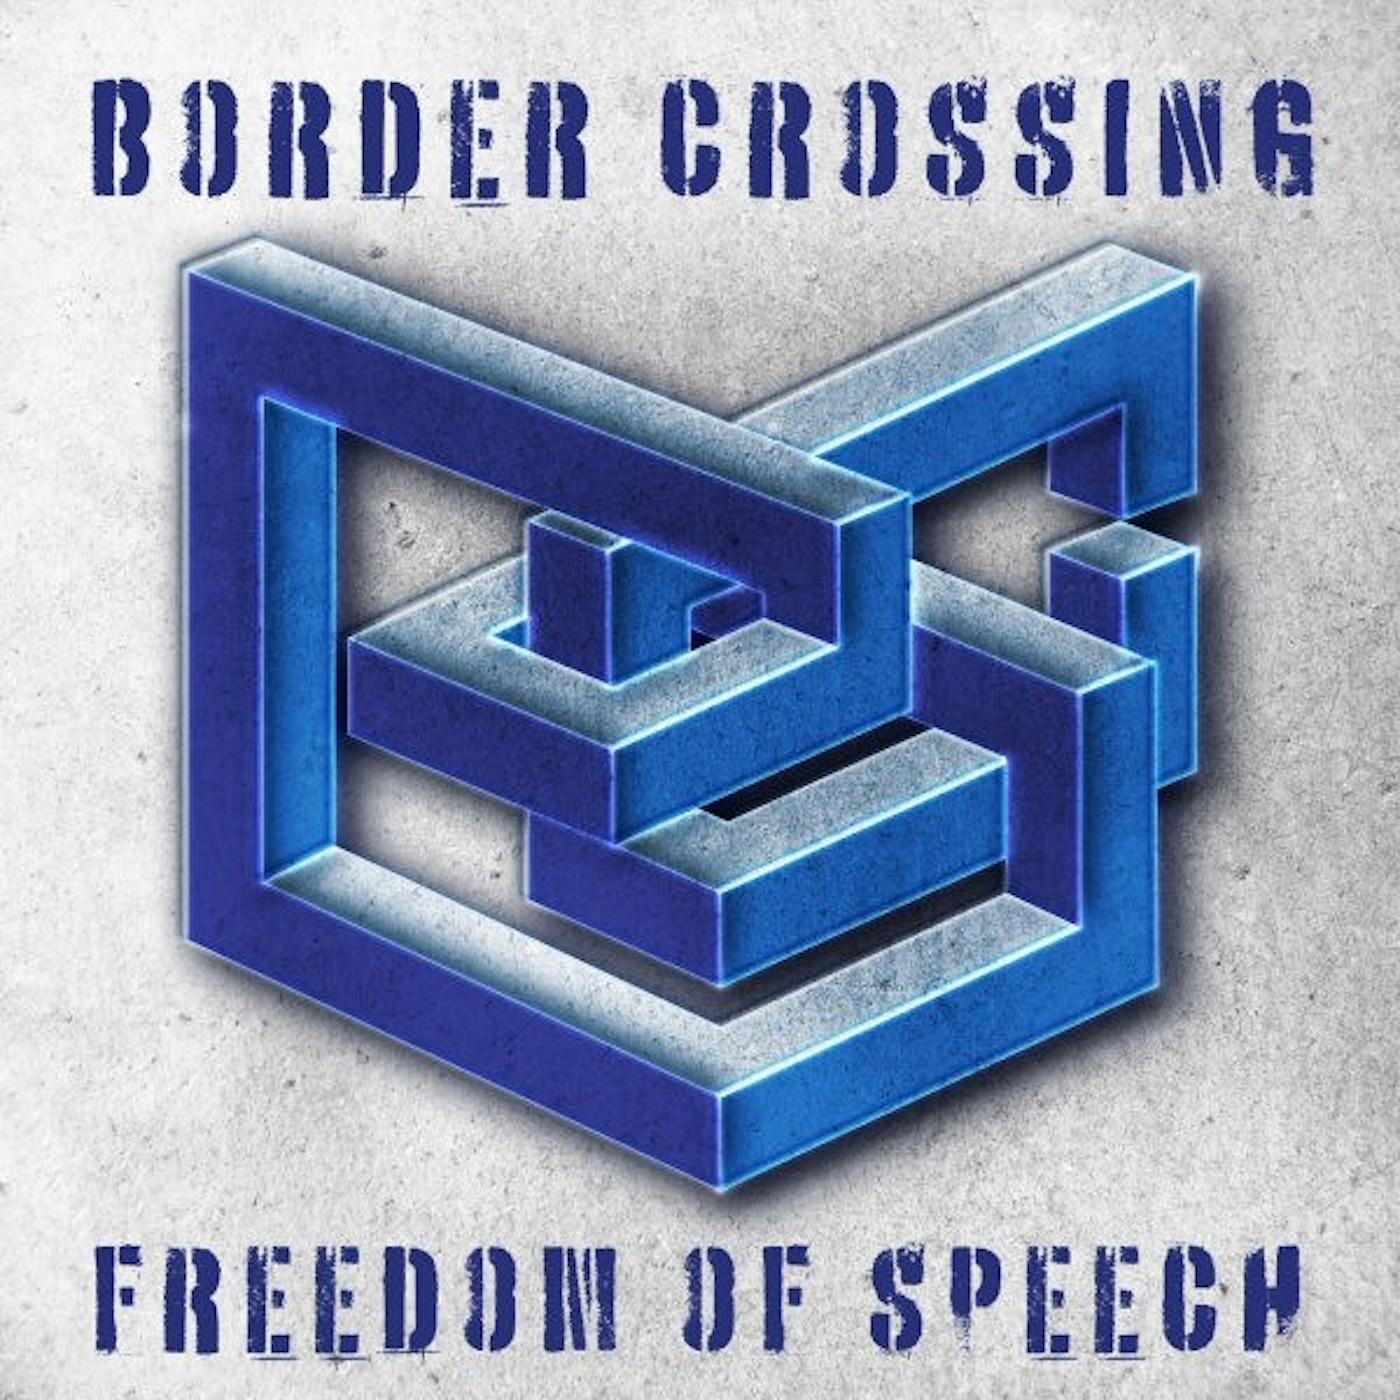 B77011-Freedom of Speech.jpeg